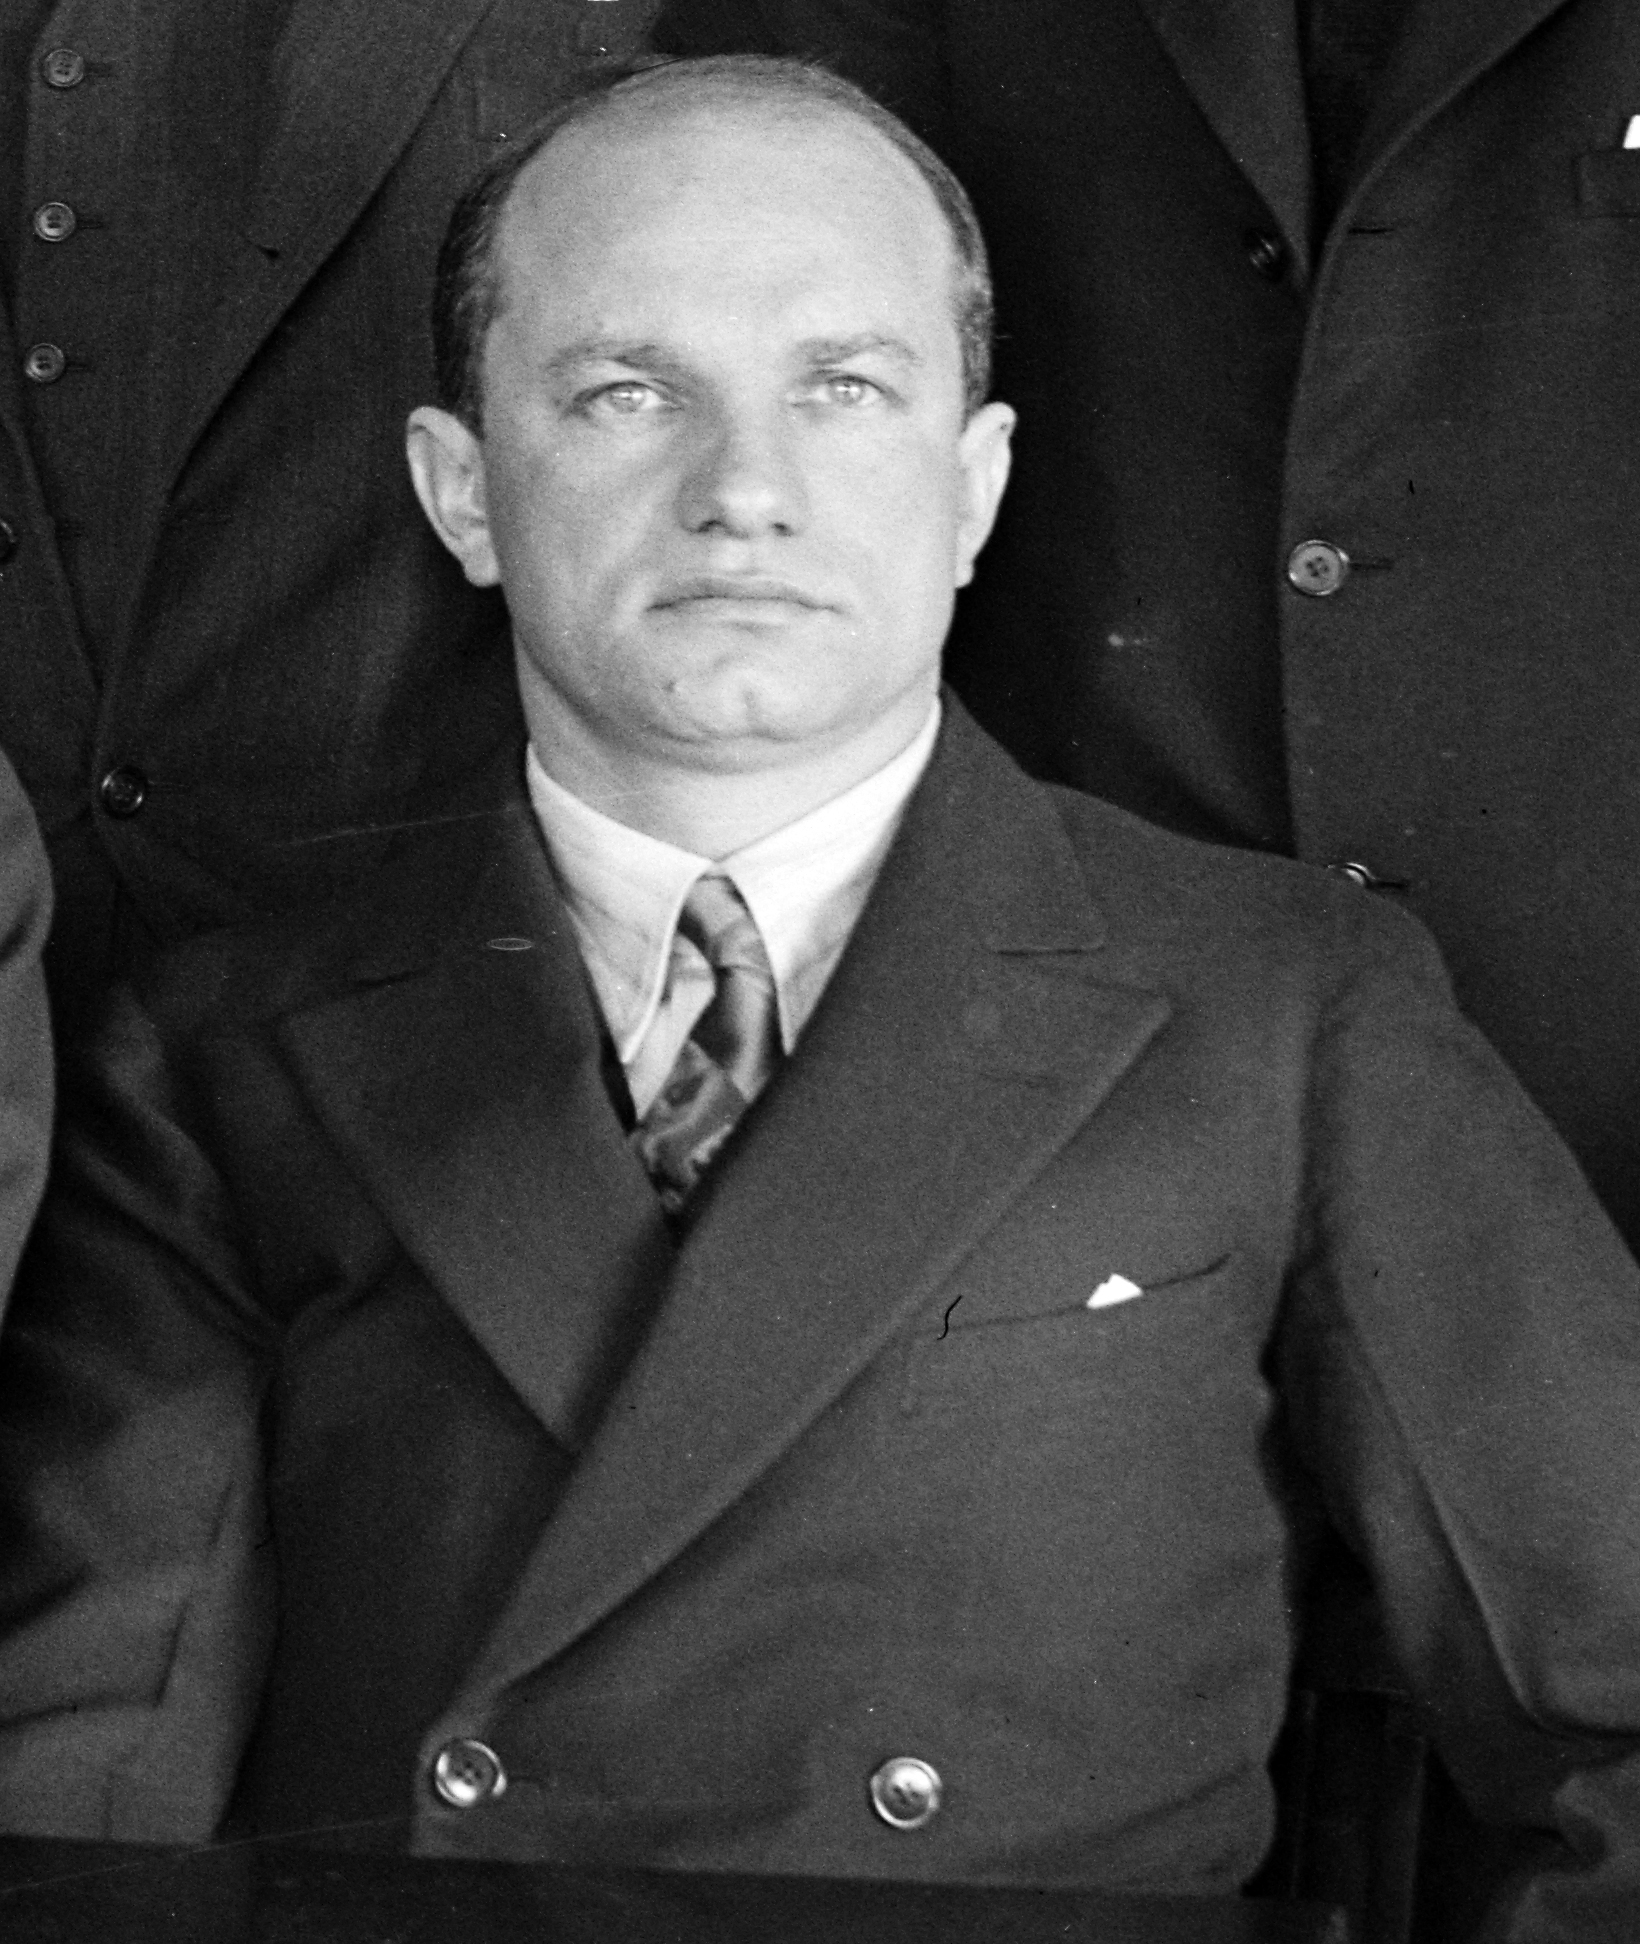 Charles Levine , aviation entrepreneur and first transatlantic air passenger. Levine was Kartveli's first employer in the United States .